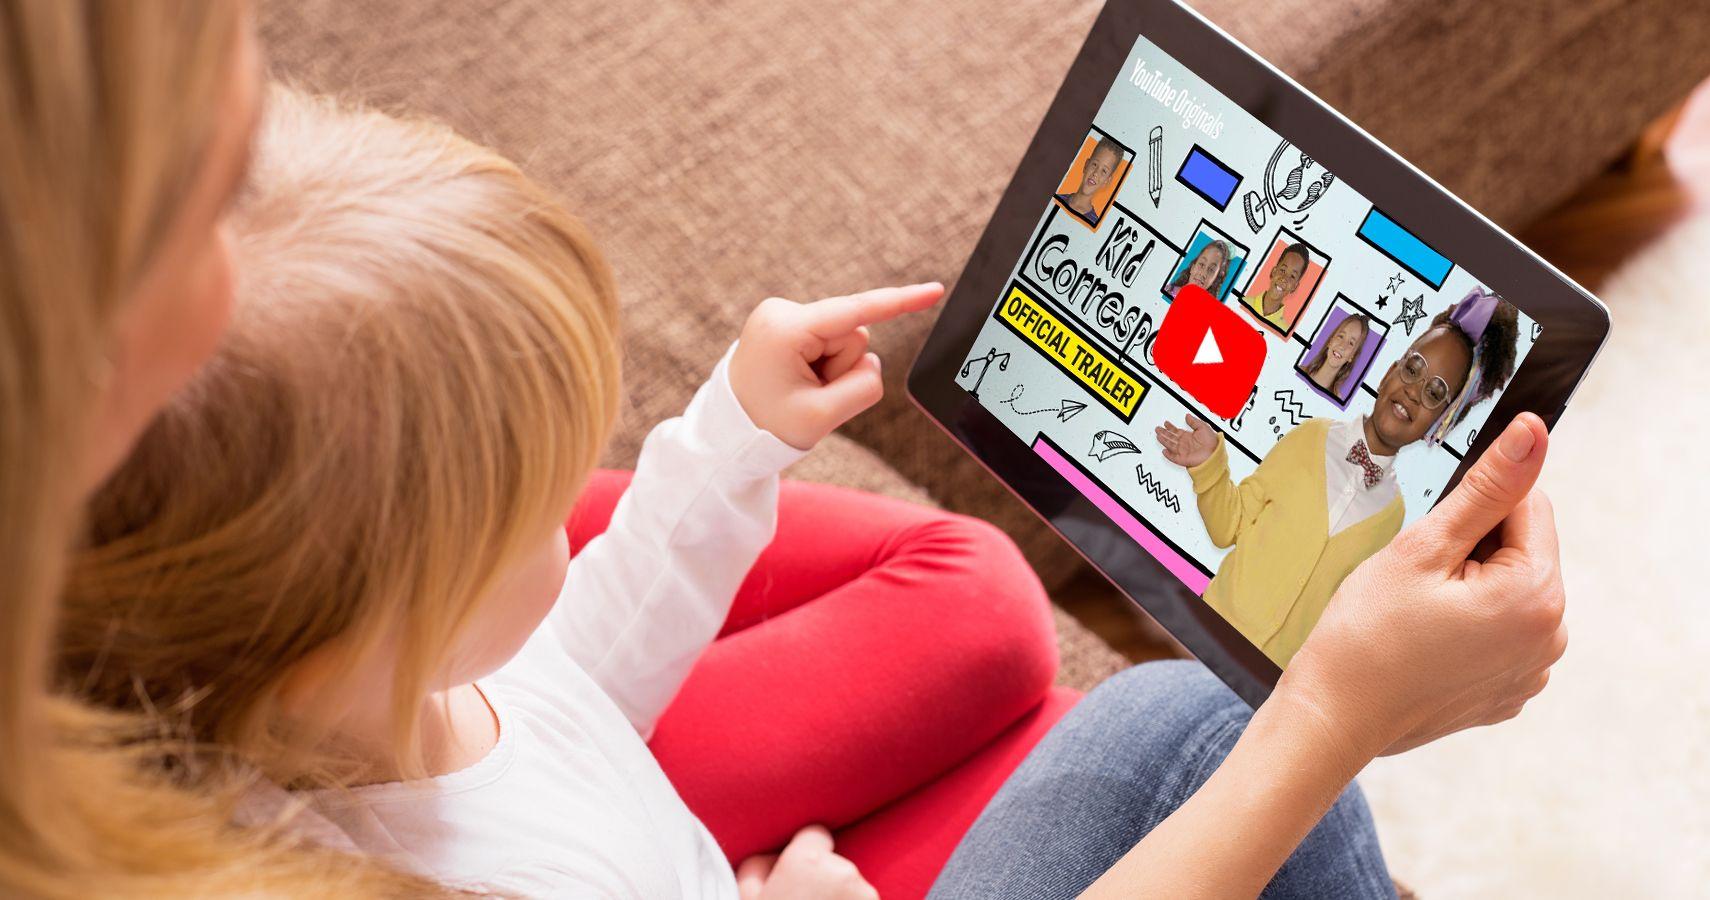 YouTube Originals Launch 'Kid Correspondent' Election Series